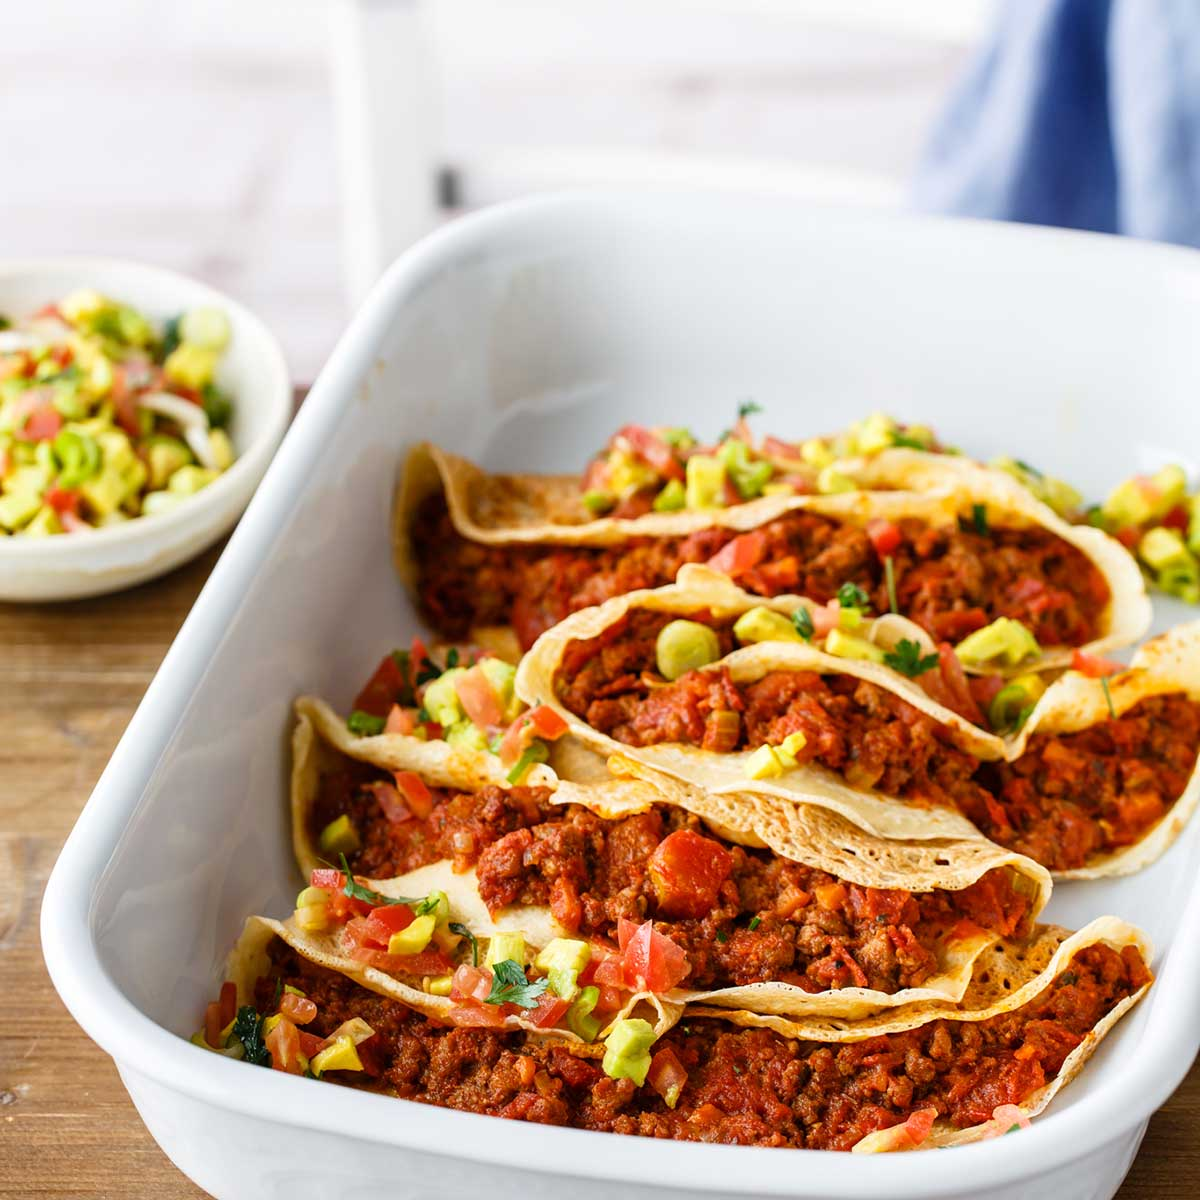 Garlic Beef Enchiladas Recipe: Easy Homemade Paleo Beef Enchiladas (Spicy, But Not Too Spicy